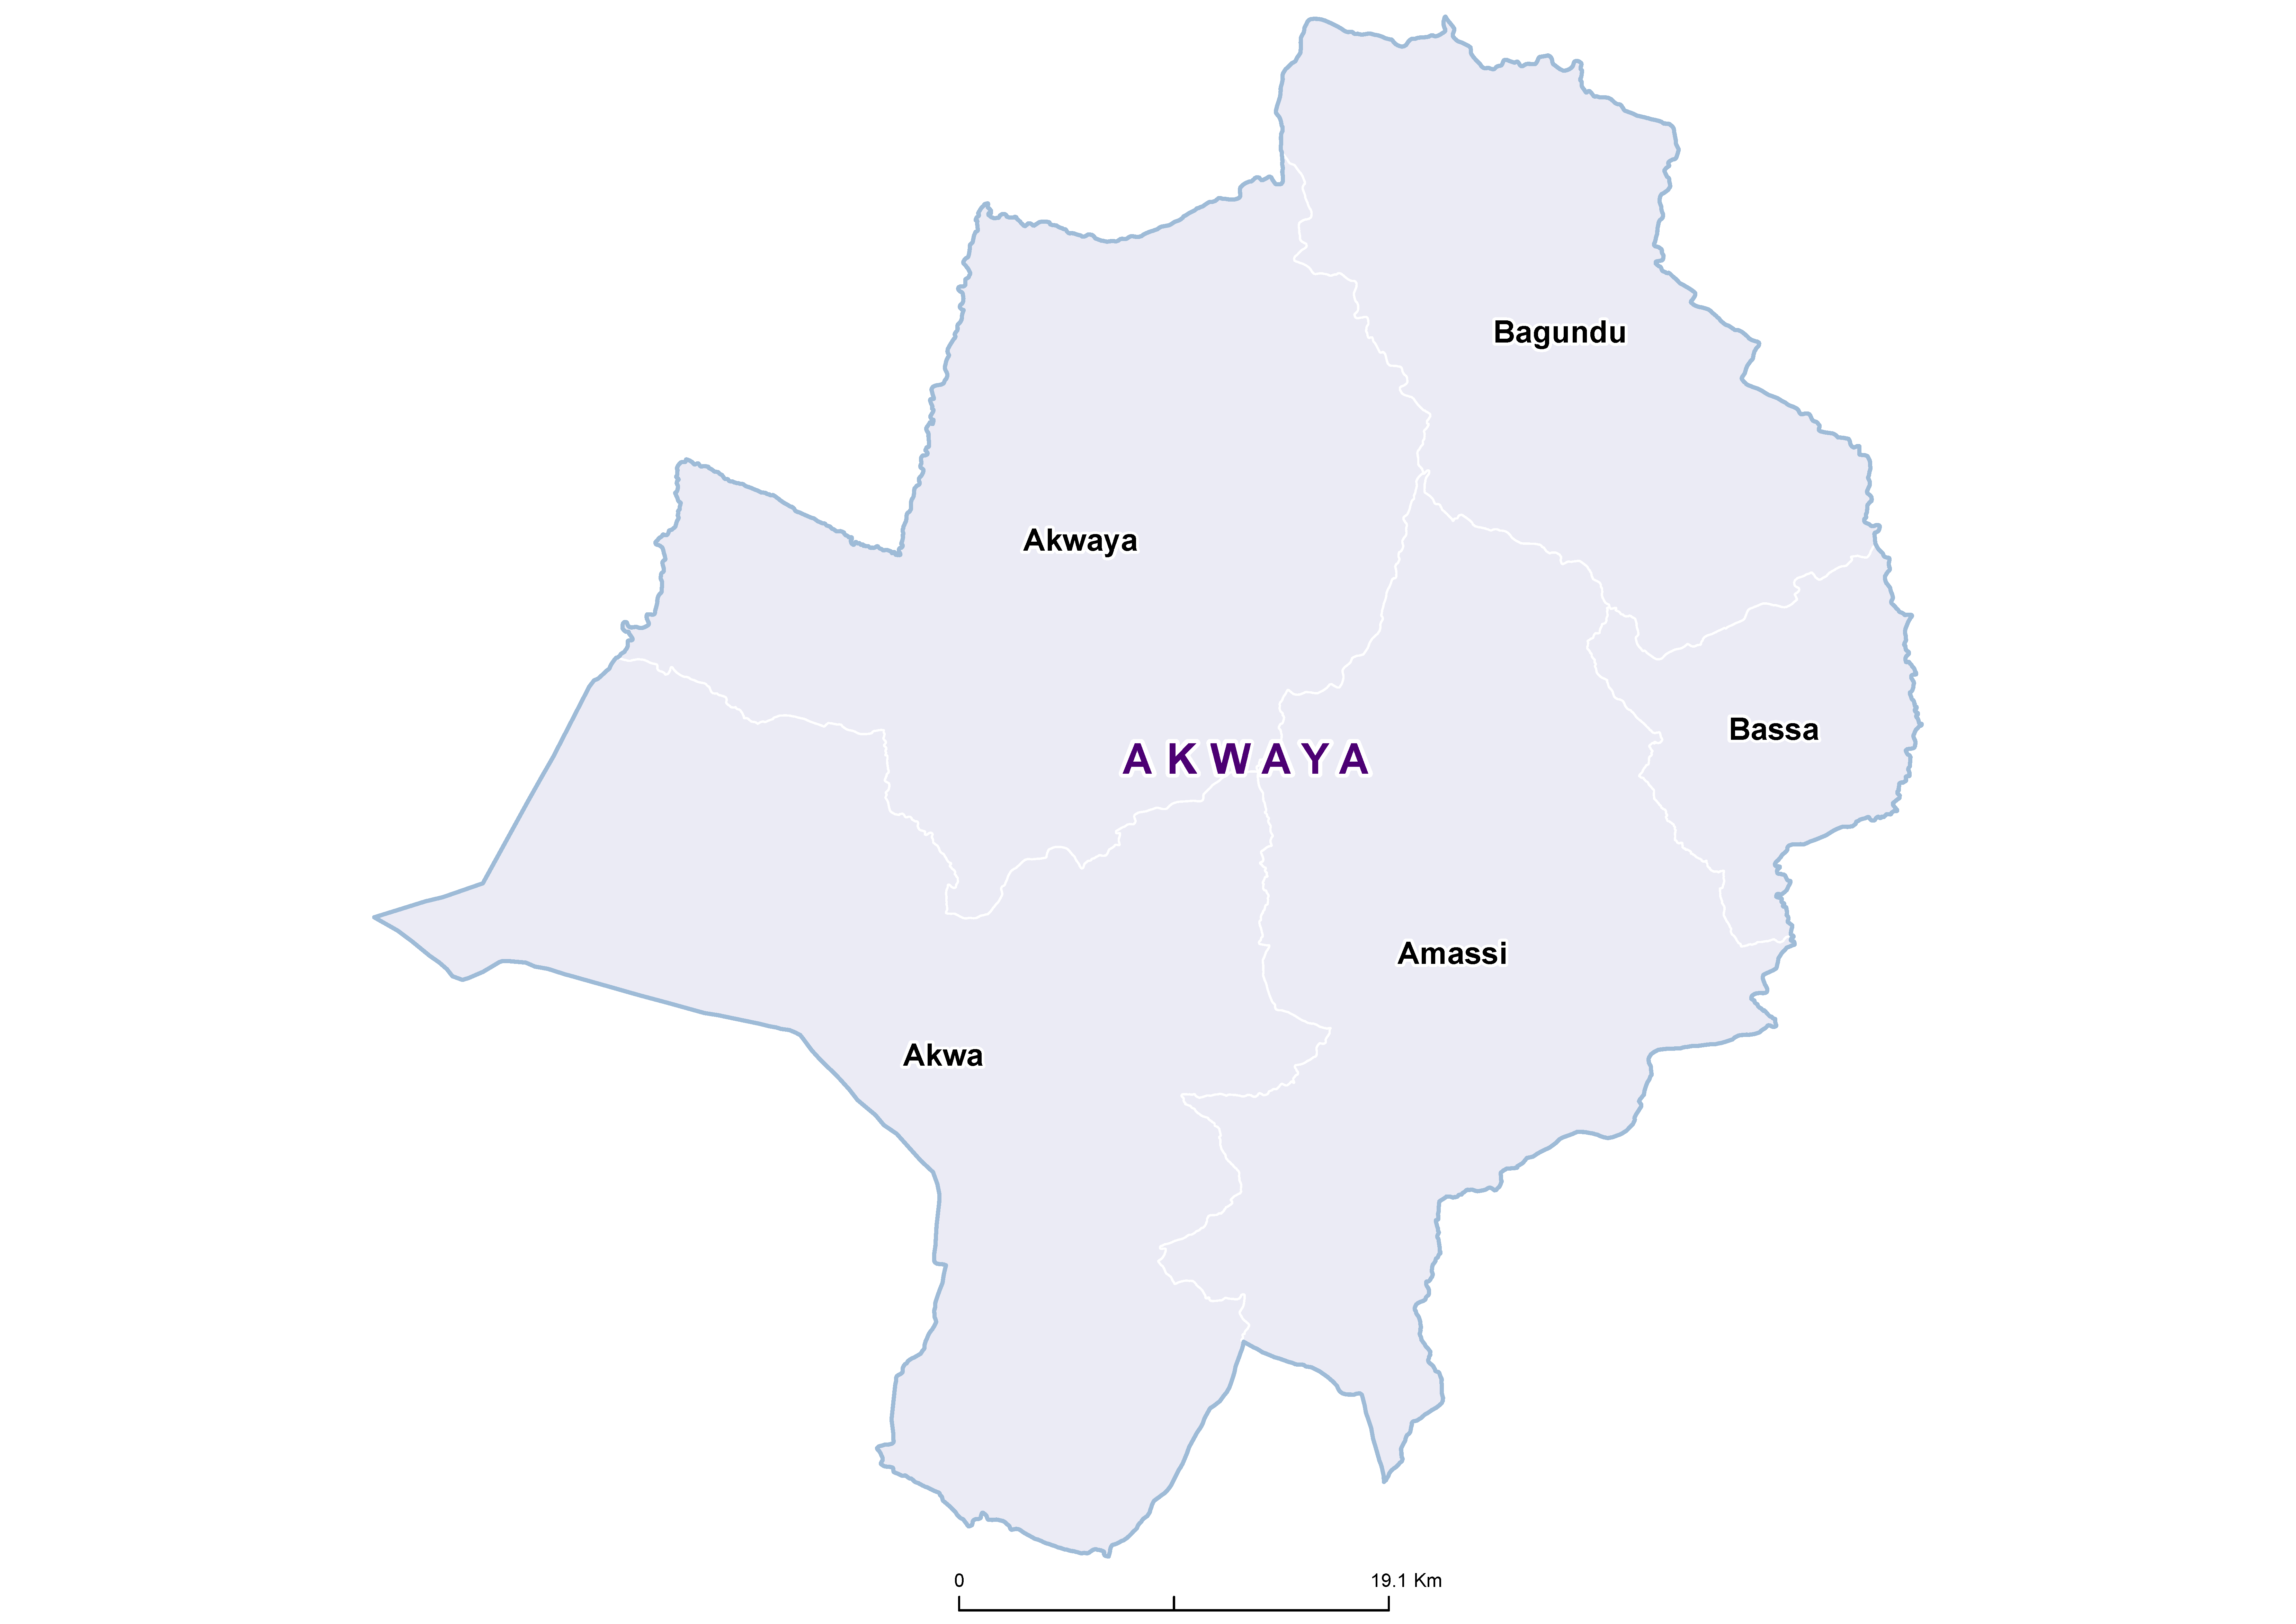 Akwaya SCH 19850001